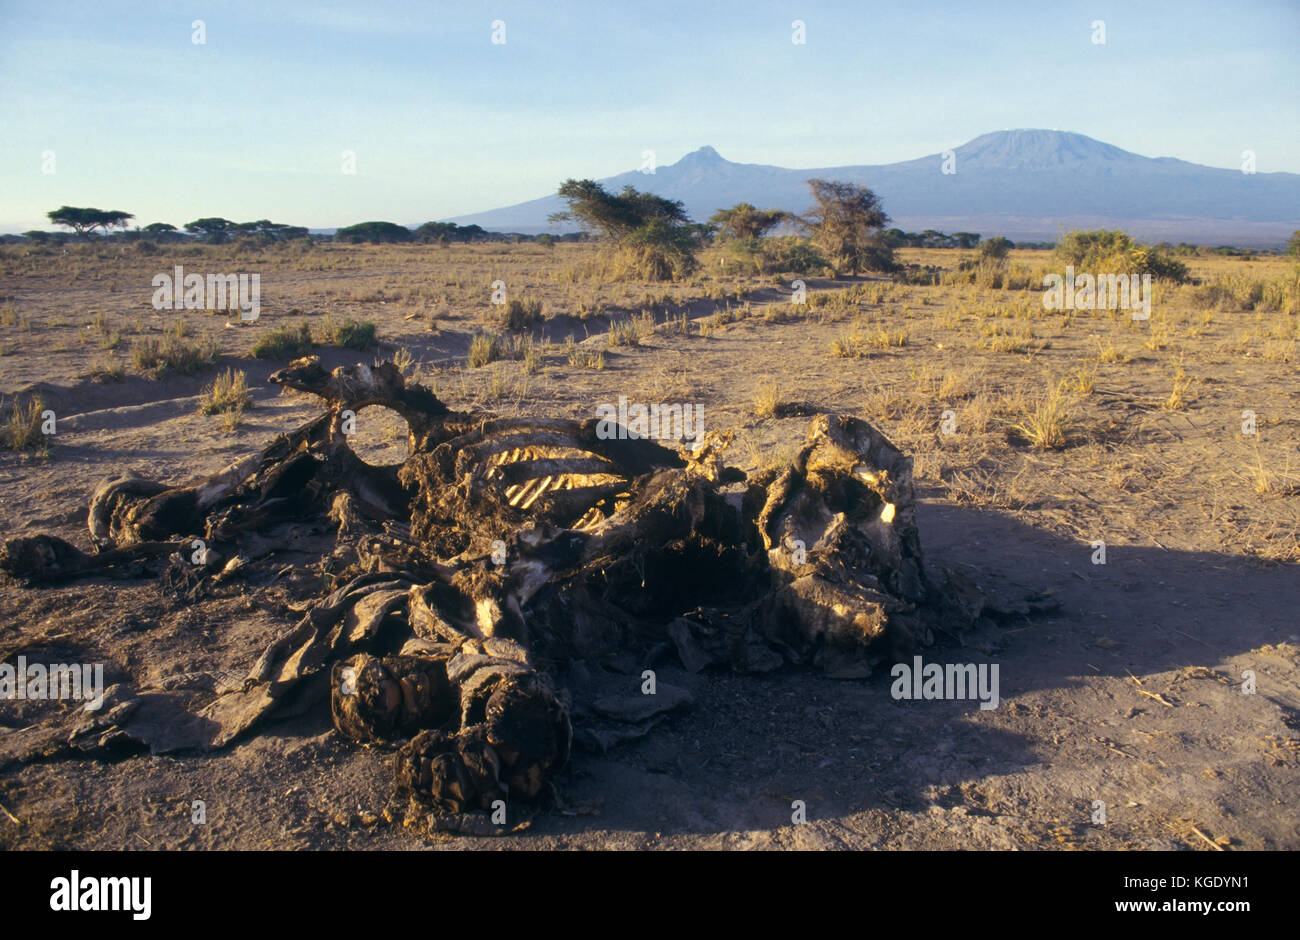 African bush elephant, Loxodonta africana. Carcass of an elephant killed by poachers to steal de ivory. Kilimanjaro - Stock Image